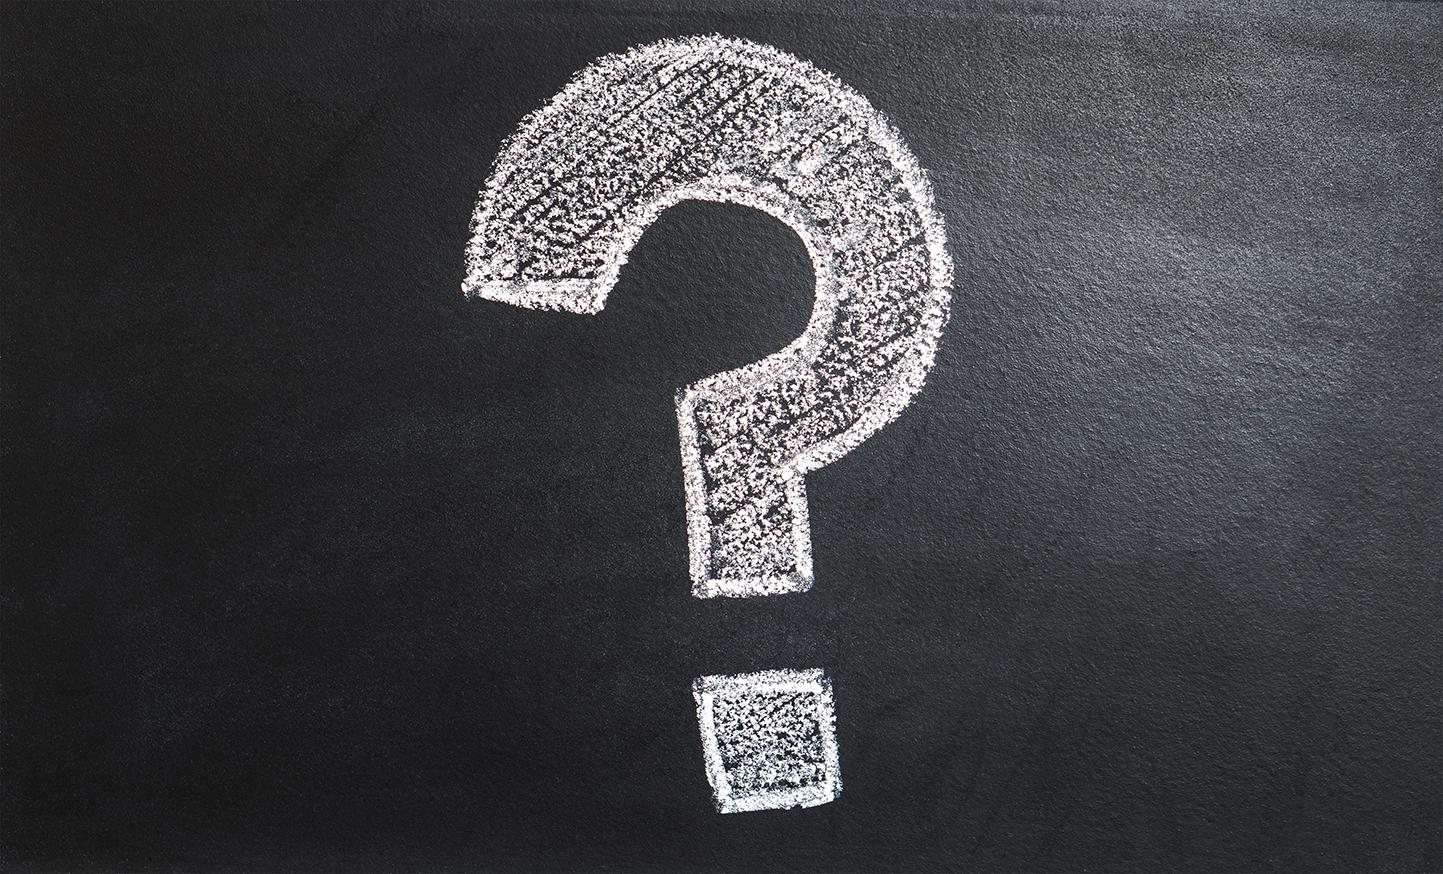 Facebook Riddle Answers- 9/14/17 - Penn-Ohio Rehabilitation